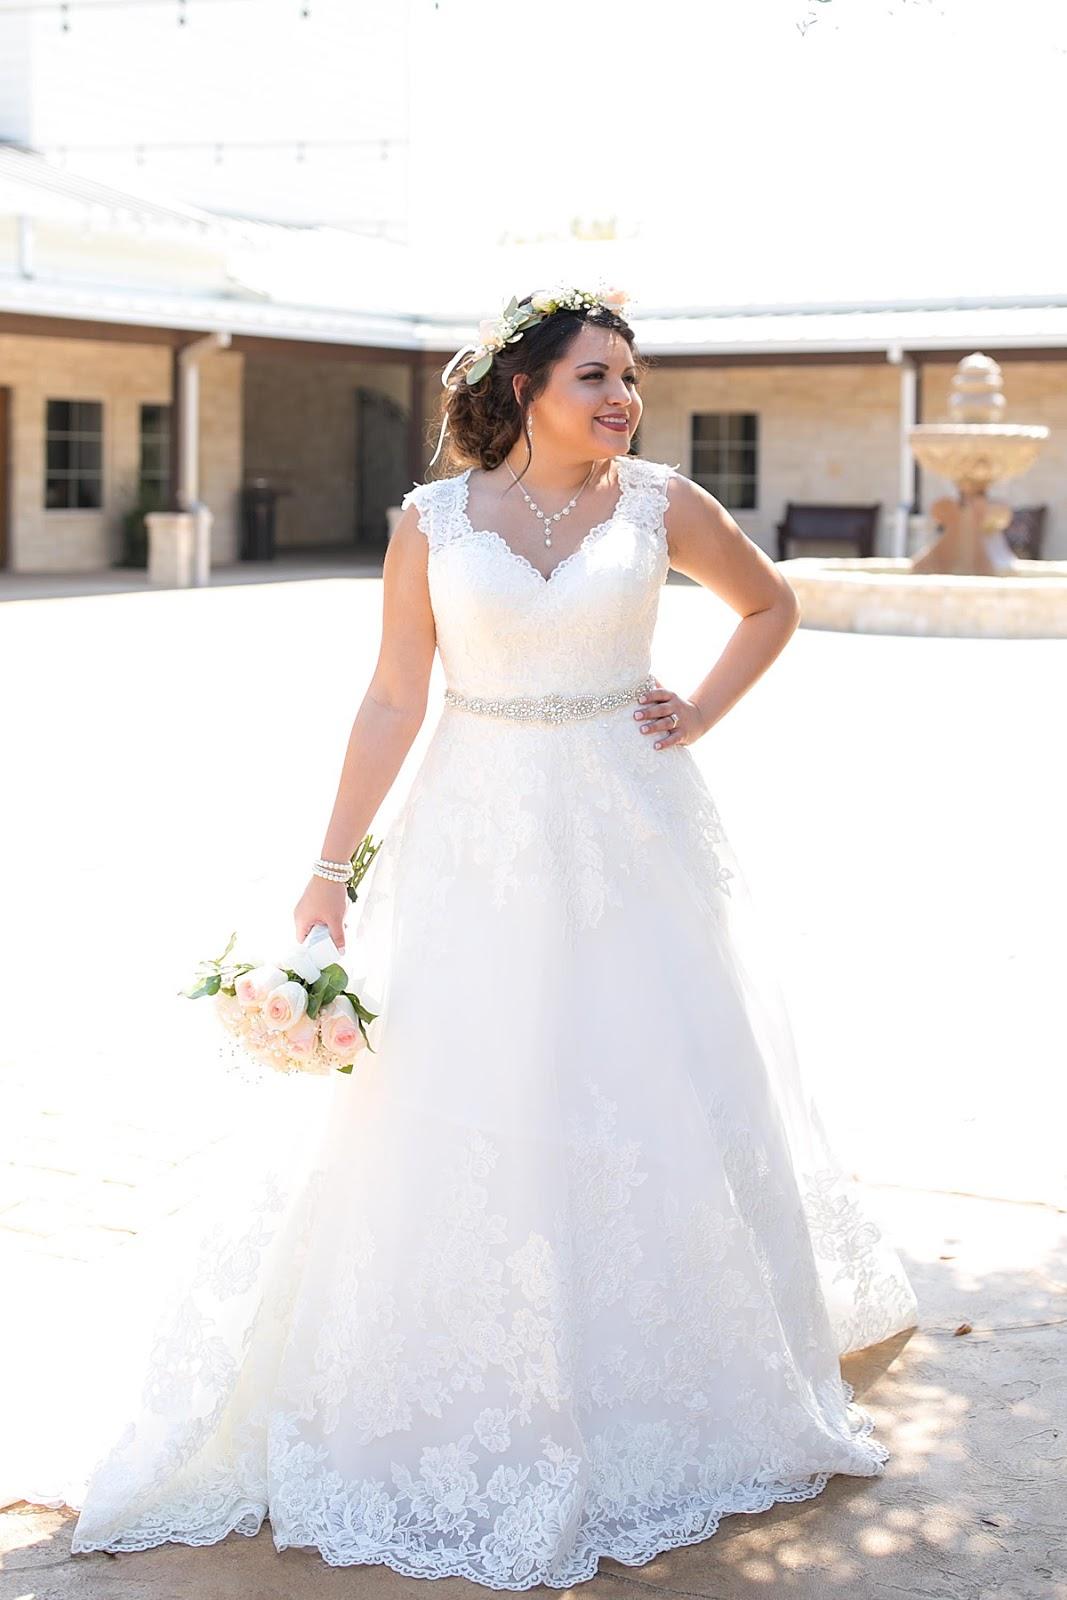 Briscoe Manor Houston Wedding Venue, Houston Wedding Photographer